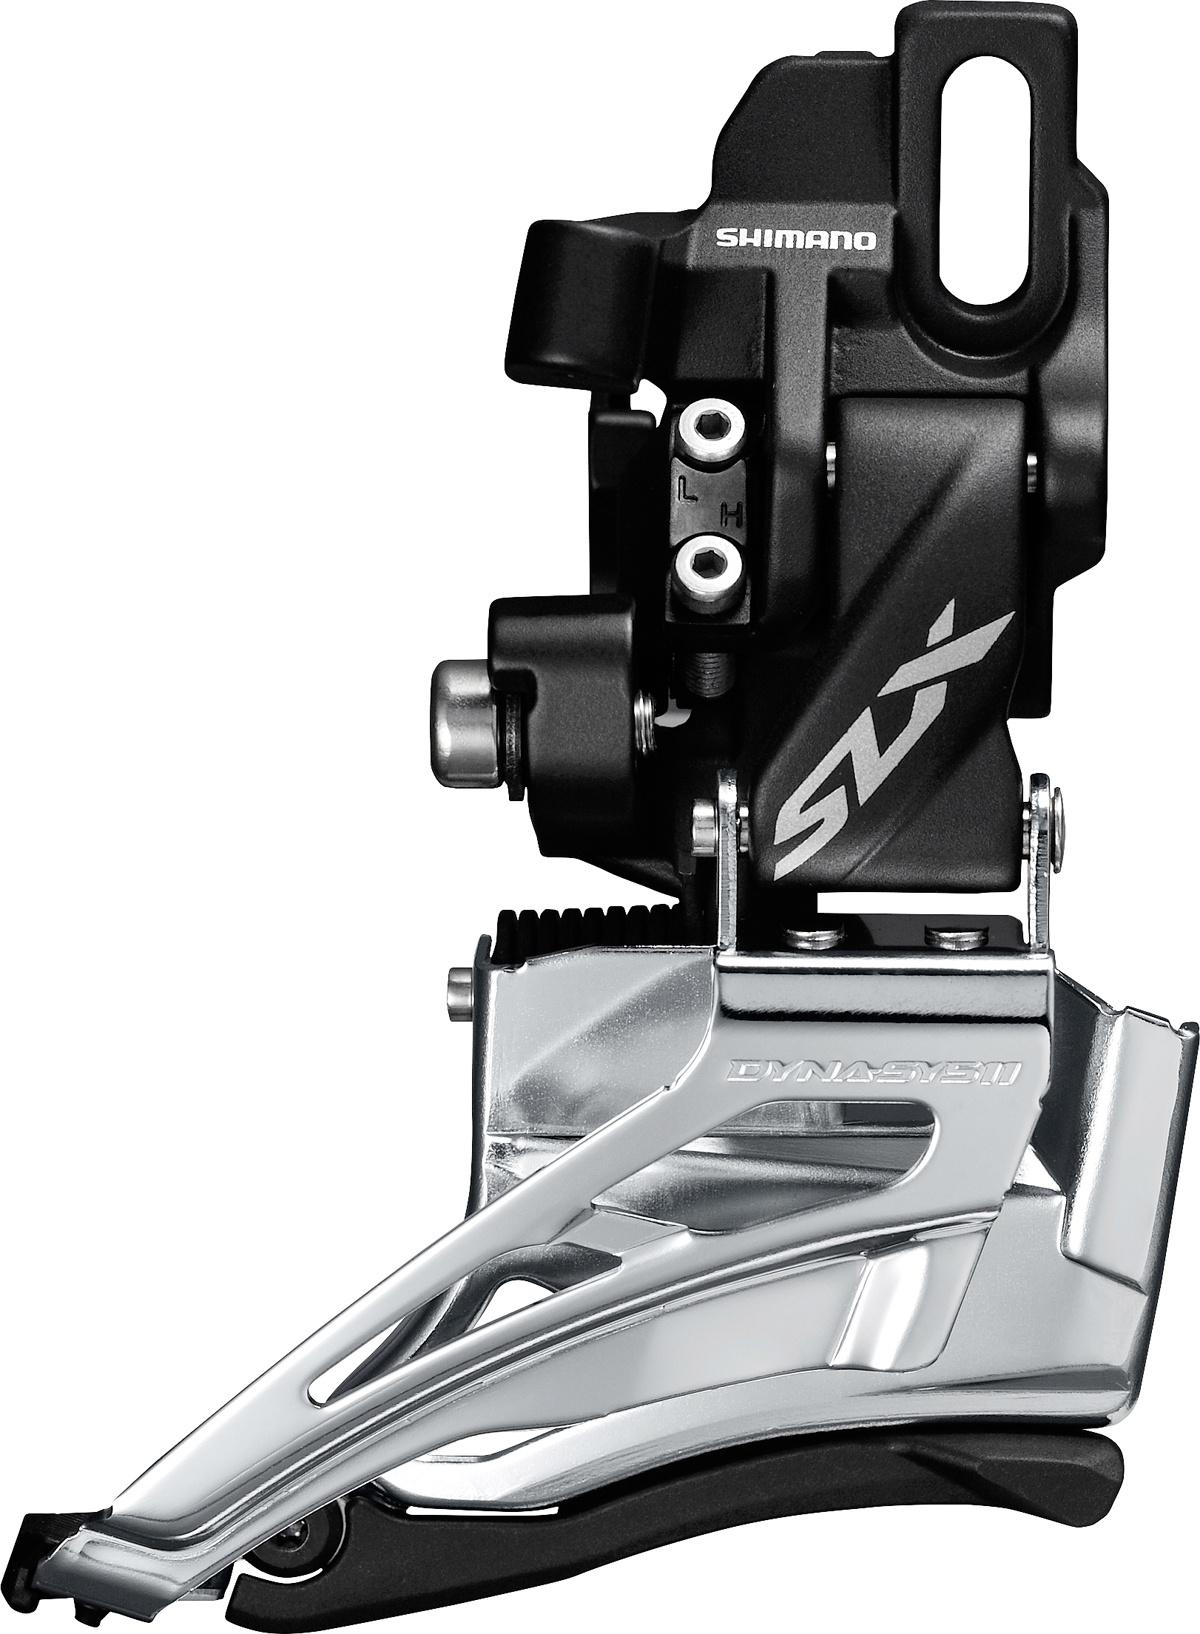 SHIMANO přesmykač SLX FD-M7020 MTB pro 2x11 př mont D-typ Down-swing dual pull 34/38 z